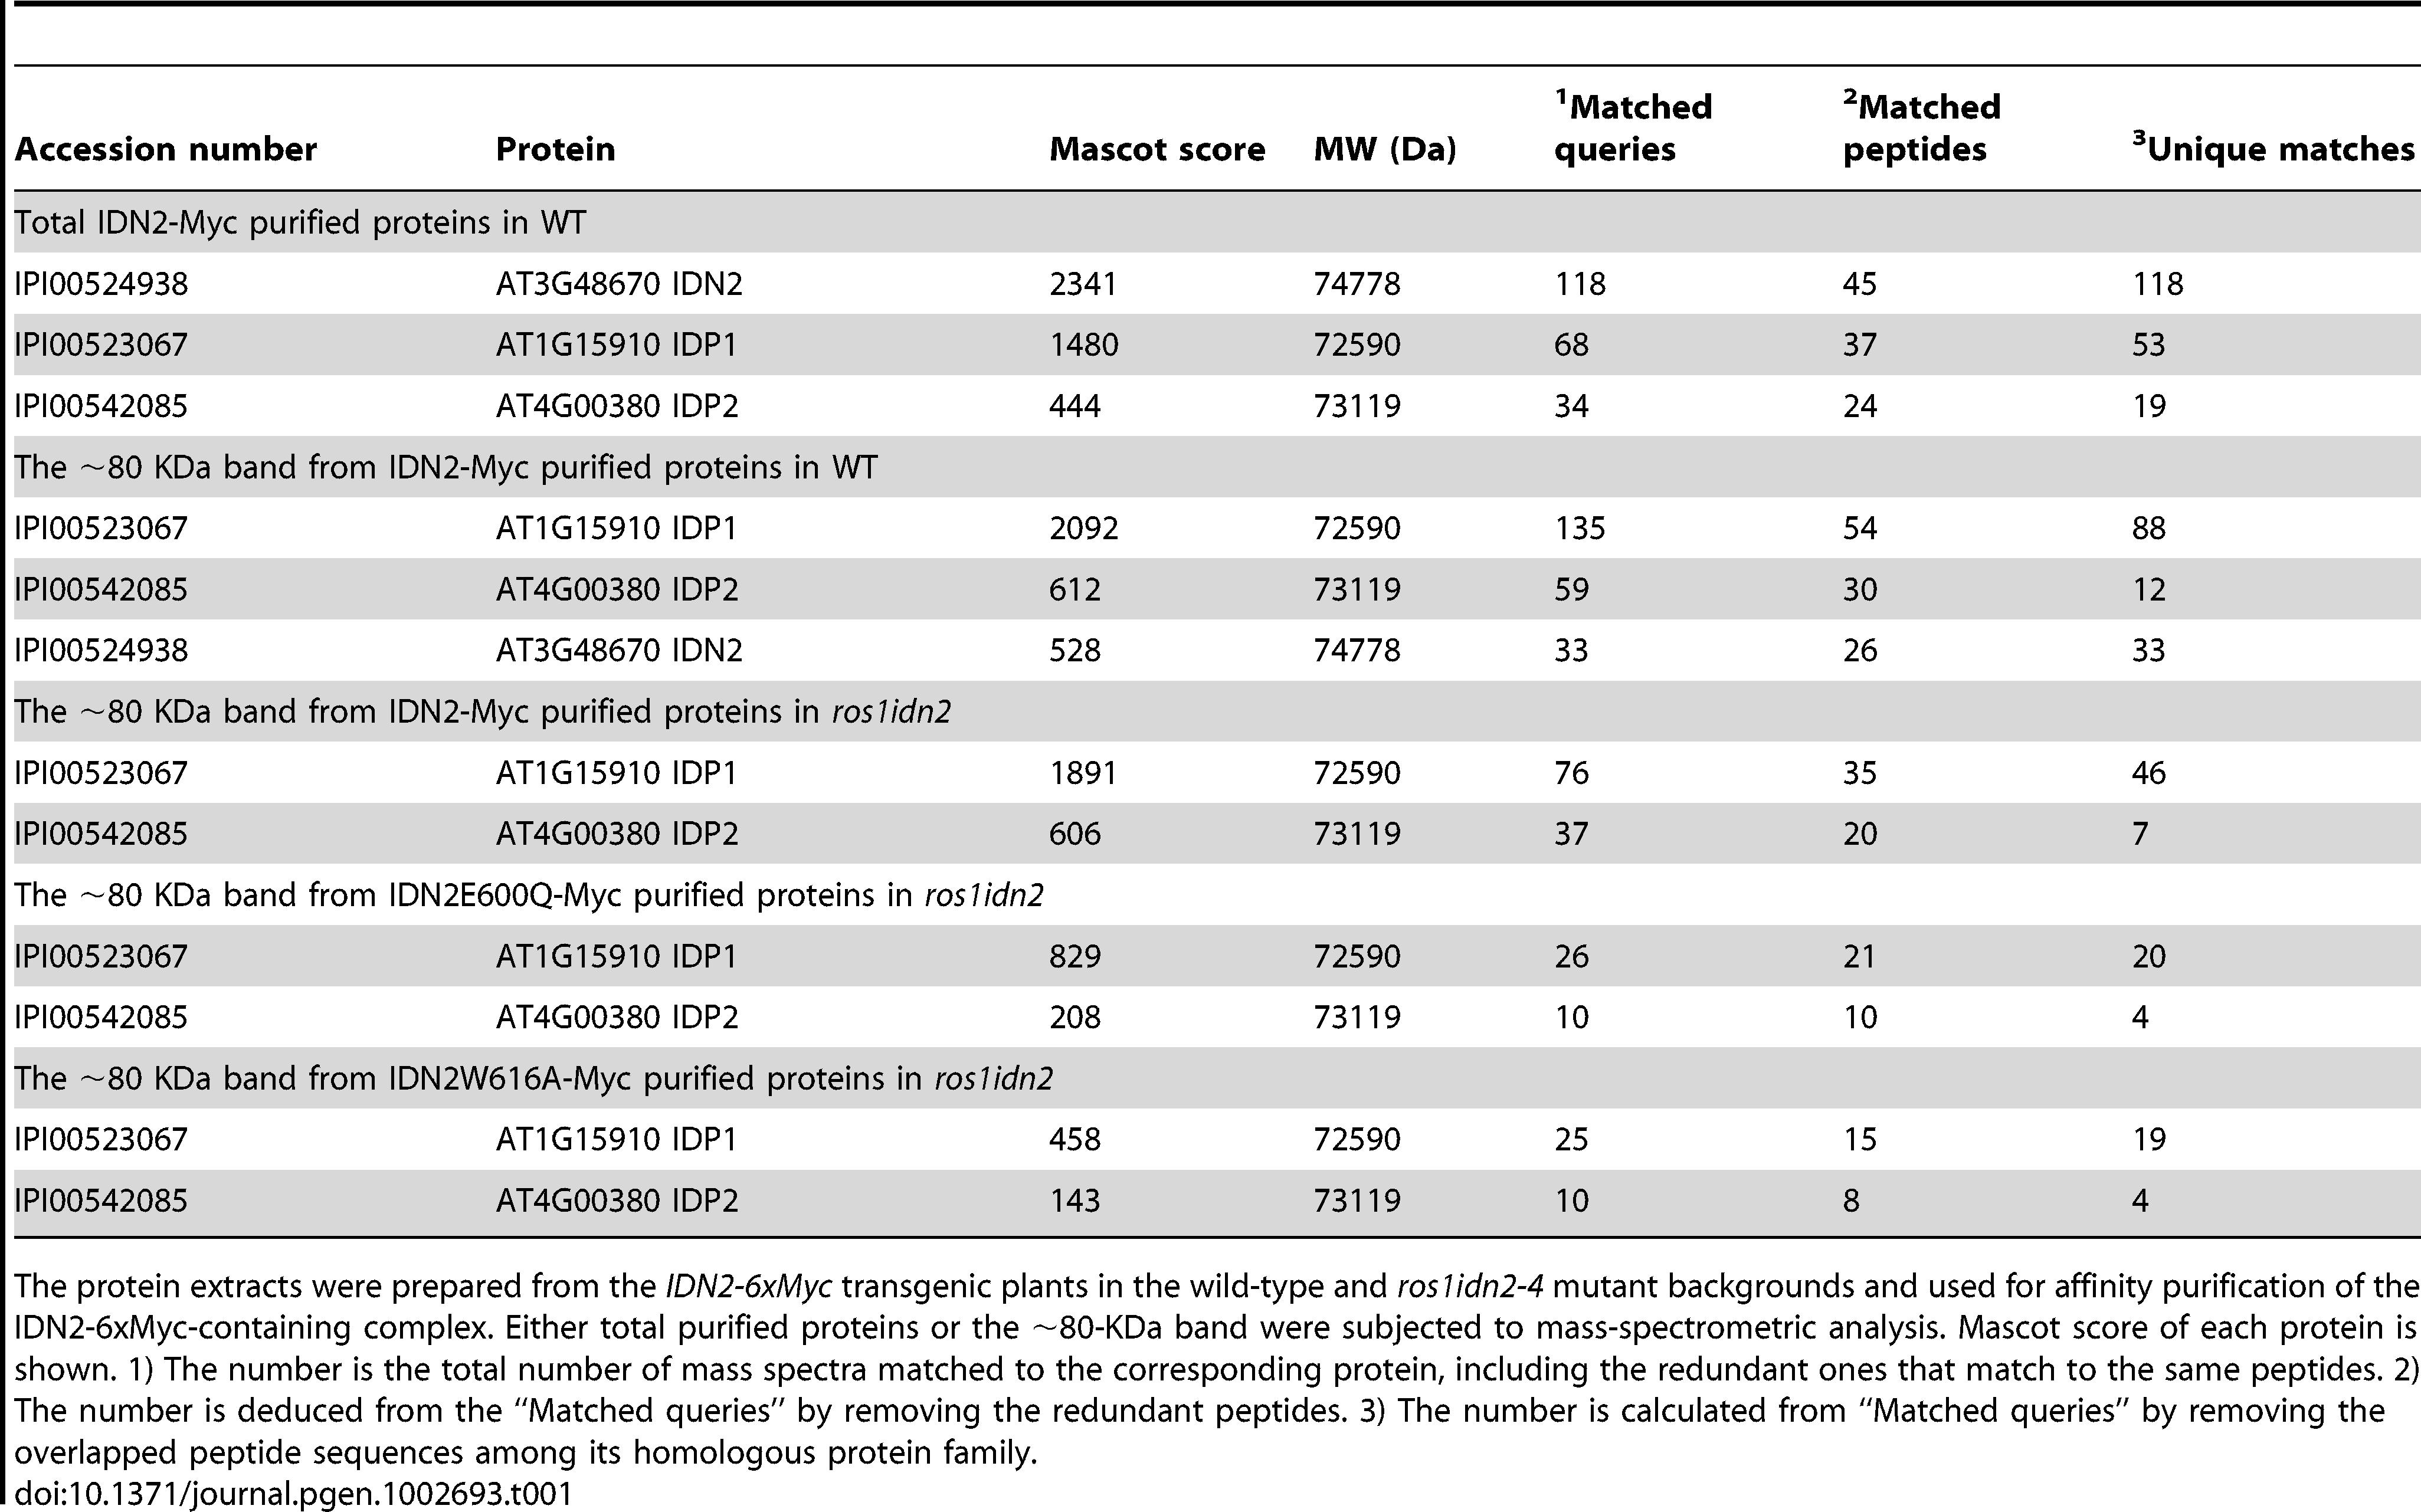 Mass-spectrometric analysis of IDN2-6xMyc affinity purification.